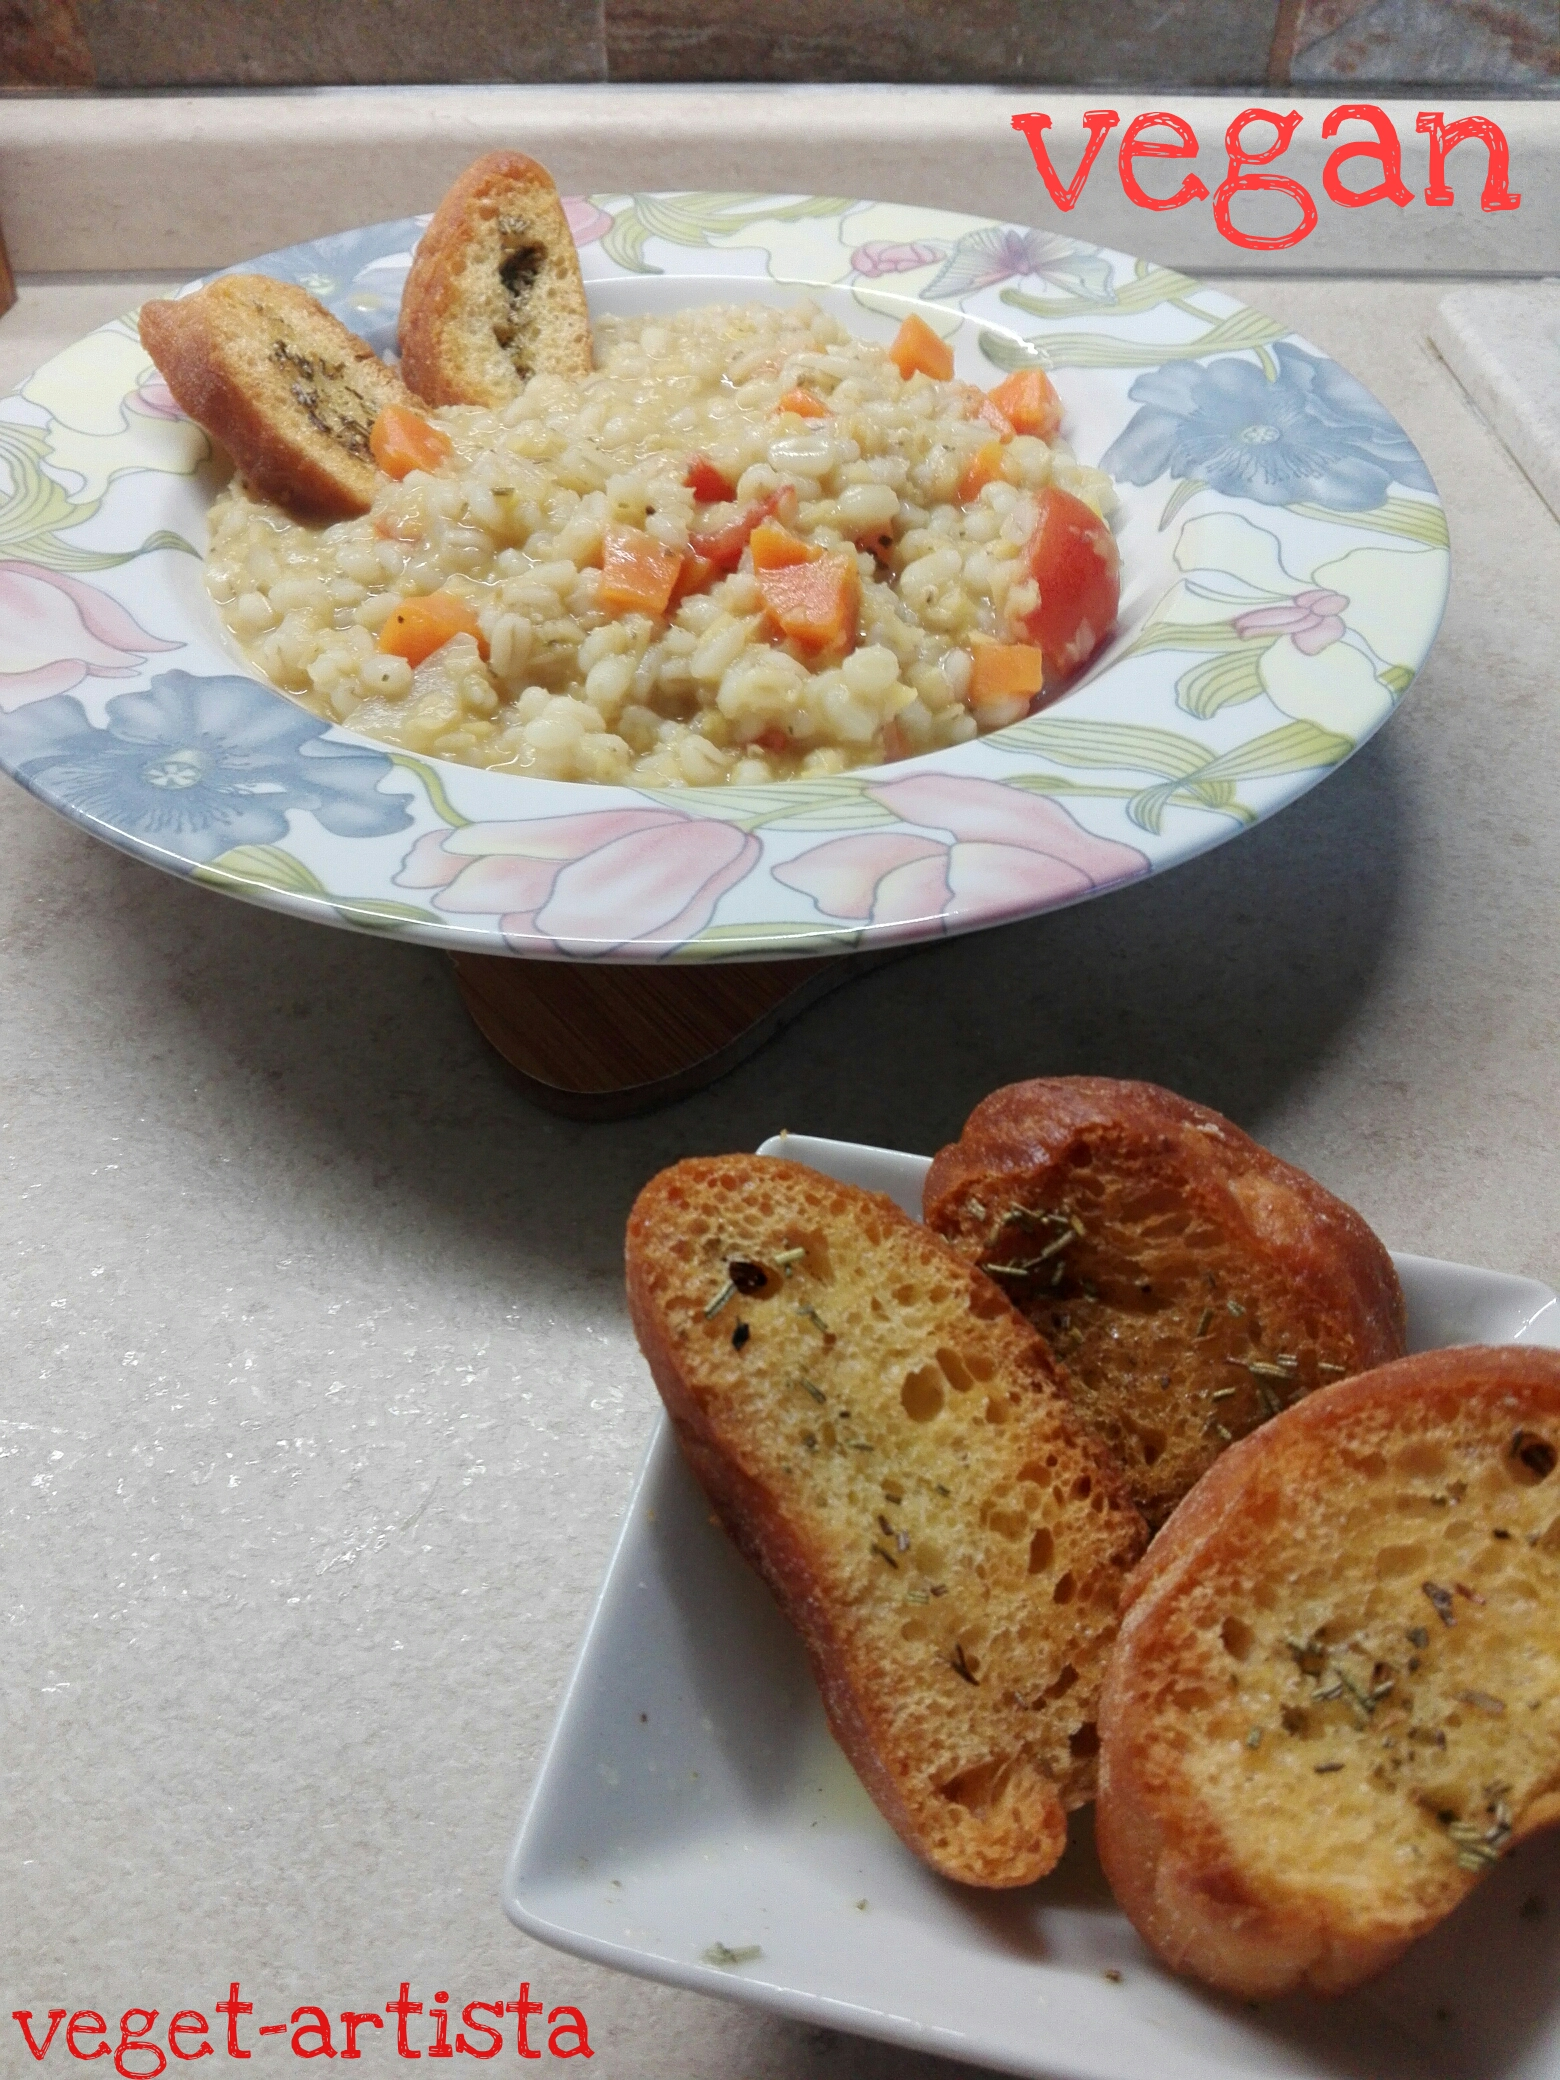 Orzo e lenticchie rosse